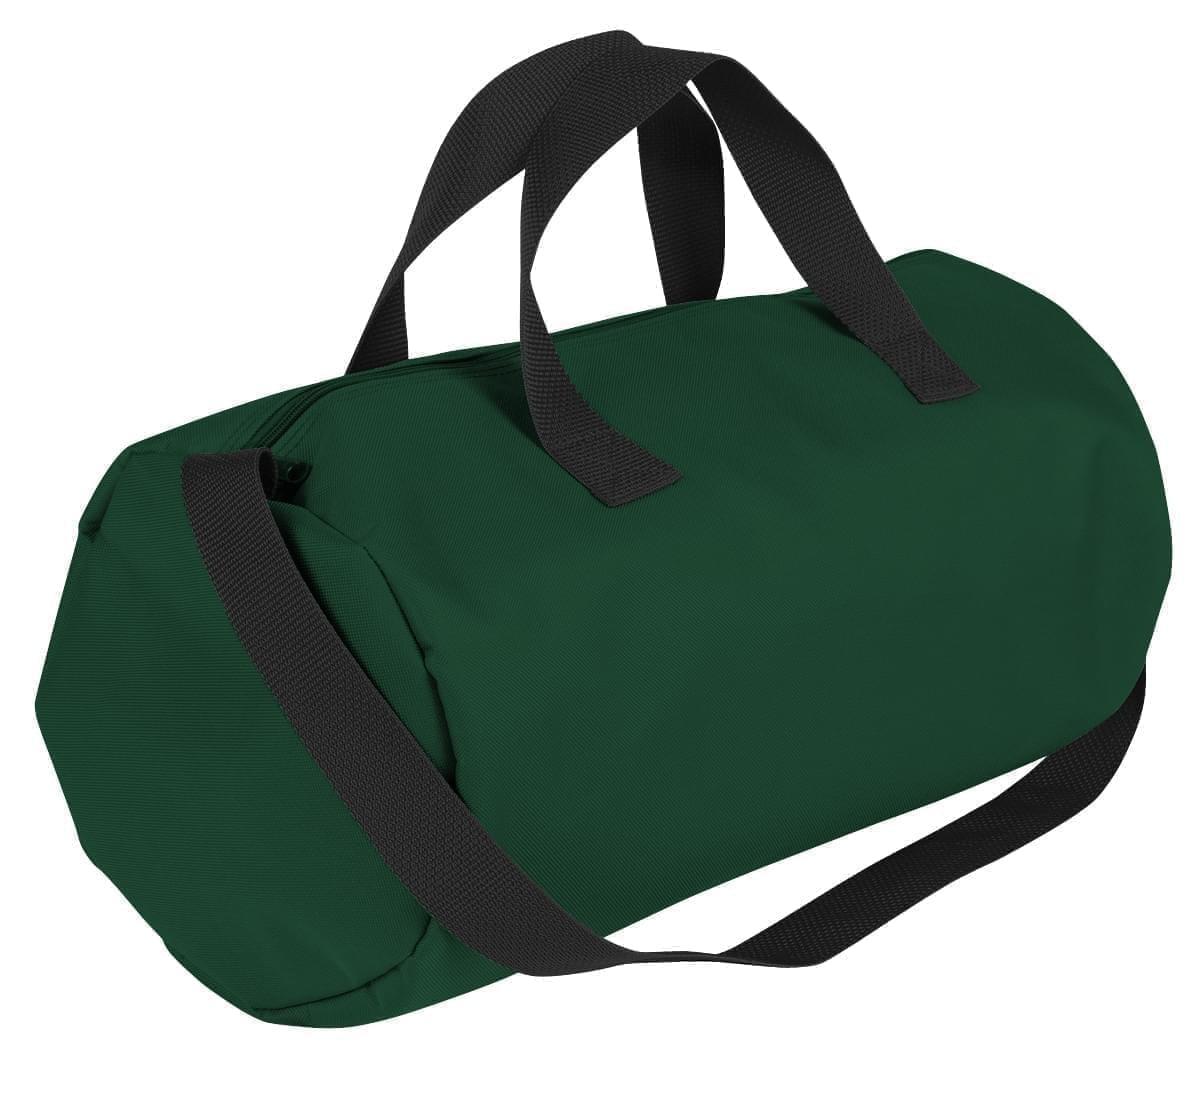 USA Made Nylon Poly Gym Roll Bags, Hunter Green-Black, ROCX31AASR